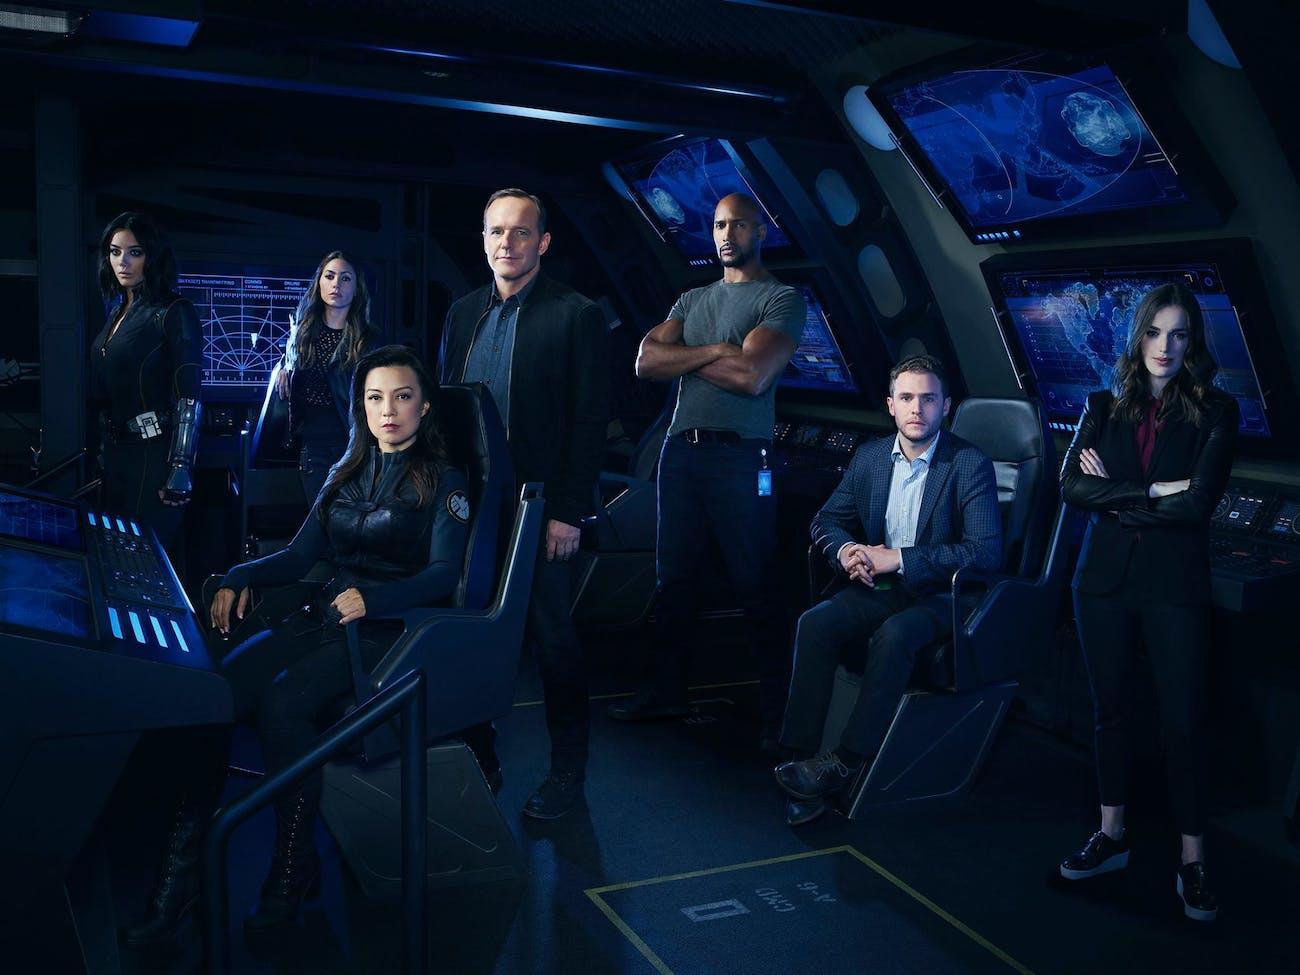 the cast of Marvel's Agents of S.H.I.E.L.D.